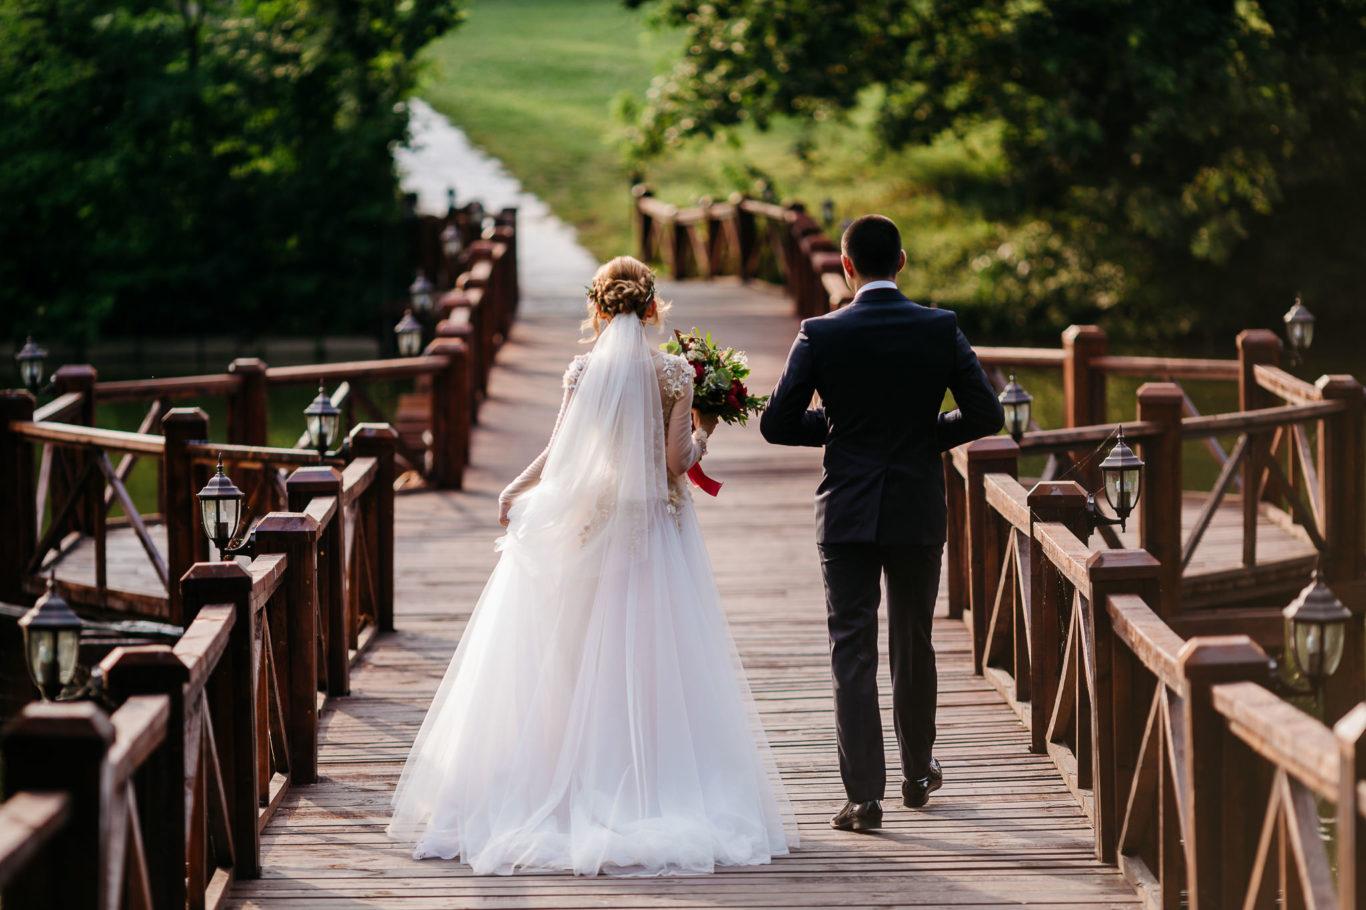 0233-Fotografie-nunta-Stirbey-Laura-Rares-fotograf-Ciprian-Dumitrescu-DCF_3534